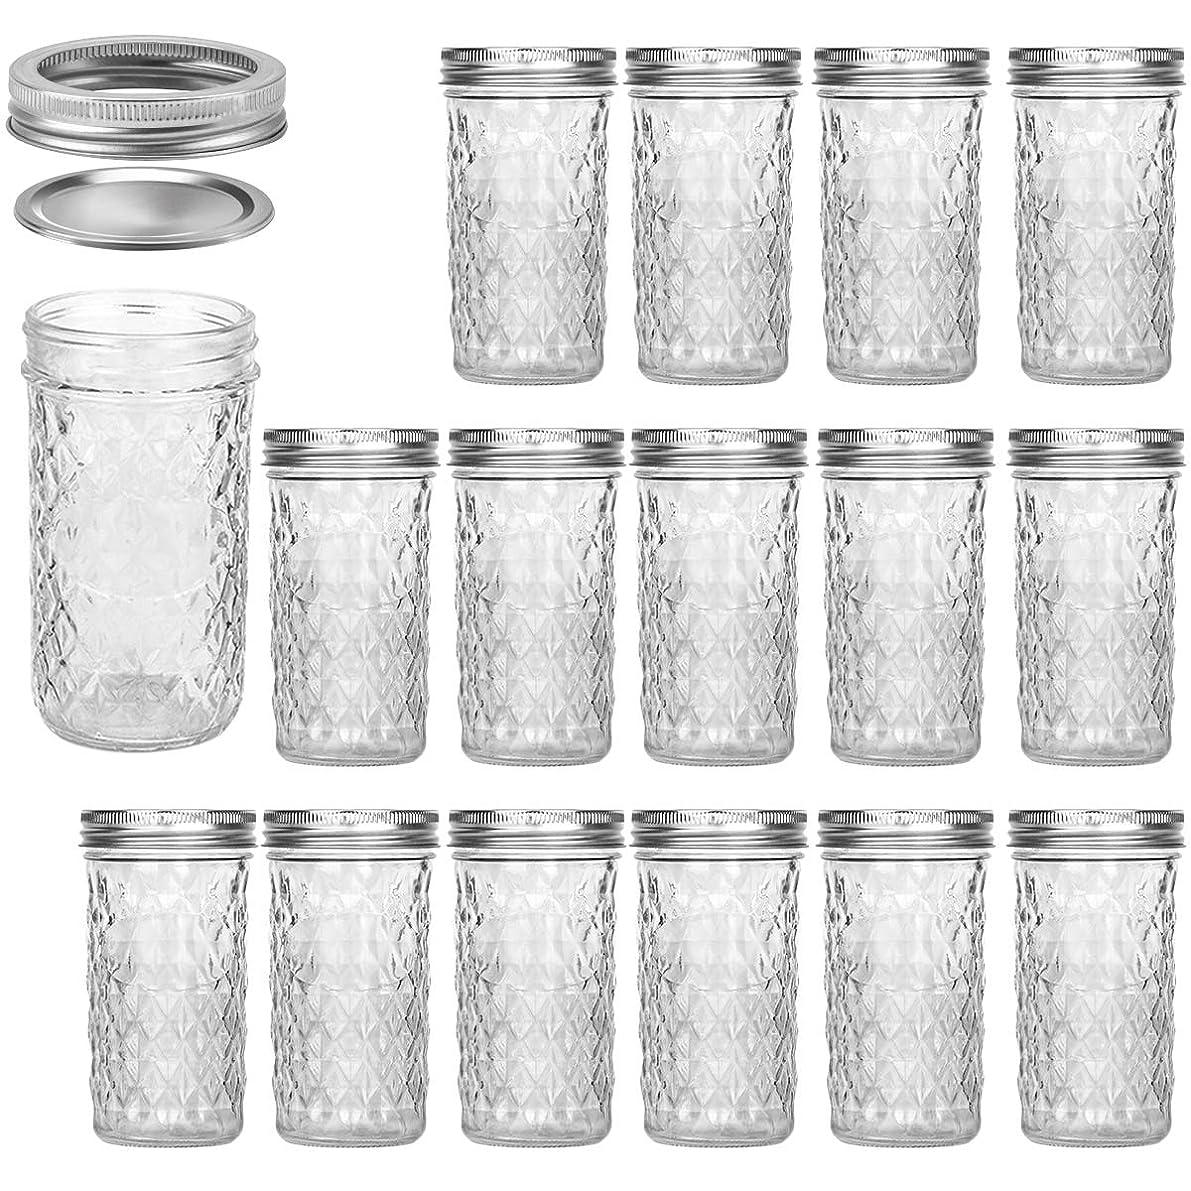 Mason Jars 12 OZ, VERONES Canning Jars Jelly Jars With Regular Lids and Bands, Ideal for Jam, Honey, Wedding Favors, Shower Favors, Baby Foods, 15 PACK